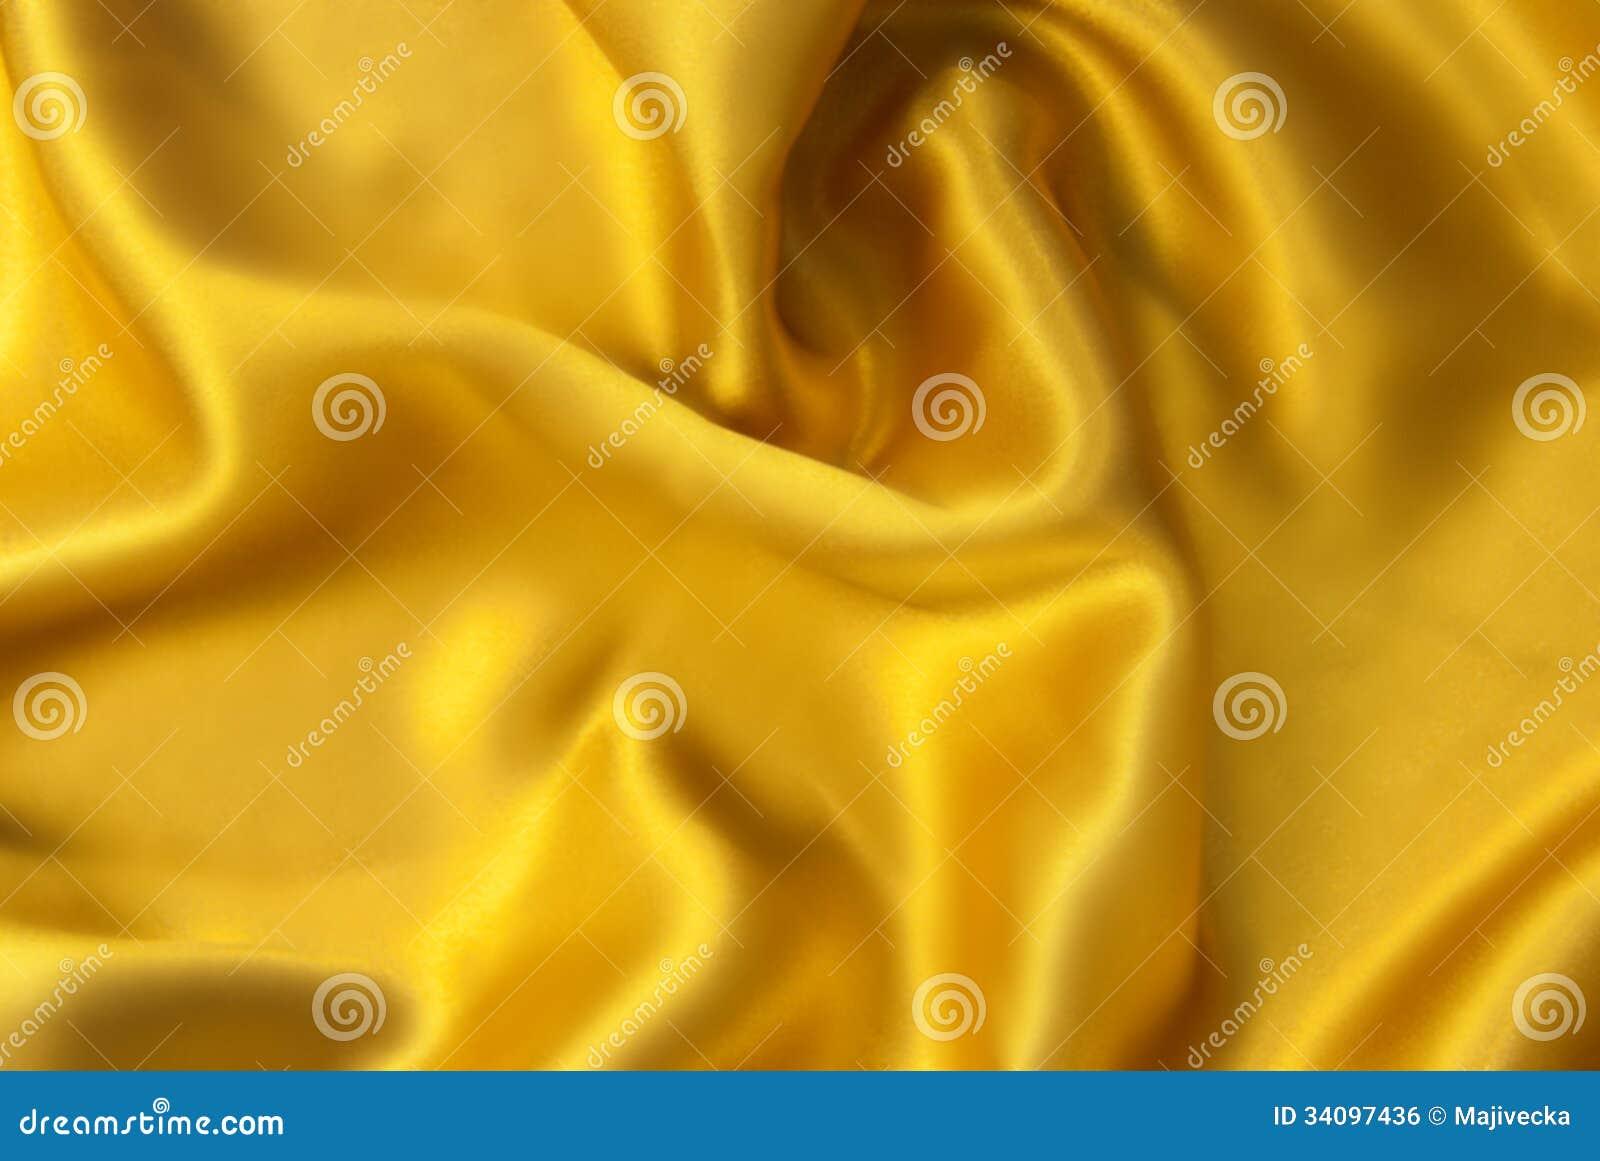 gold satin background - photo #48